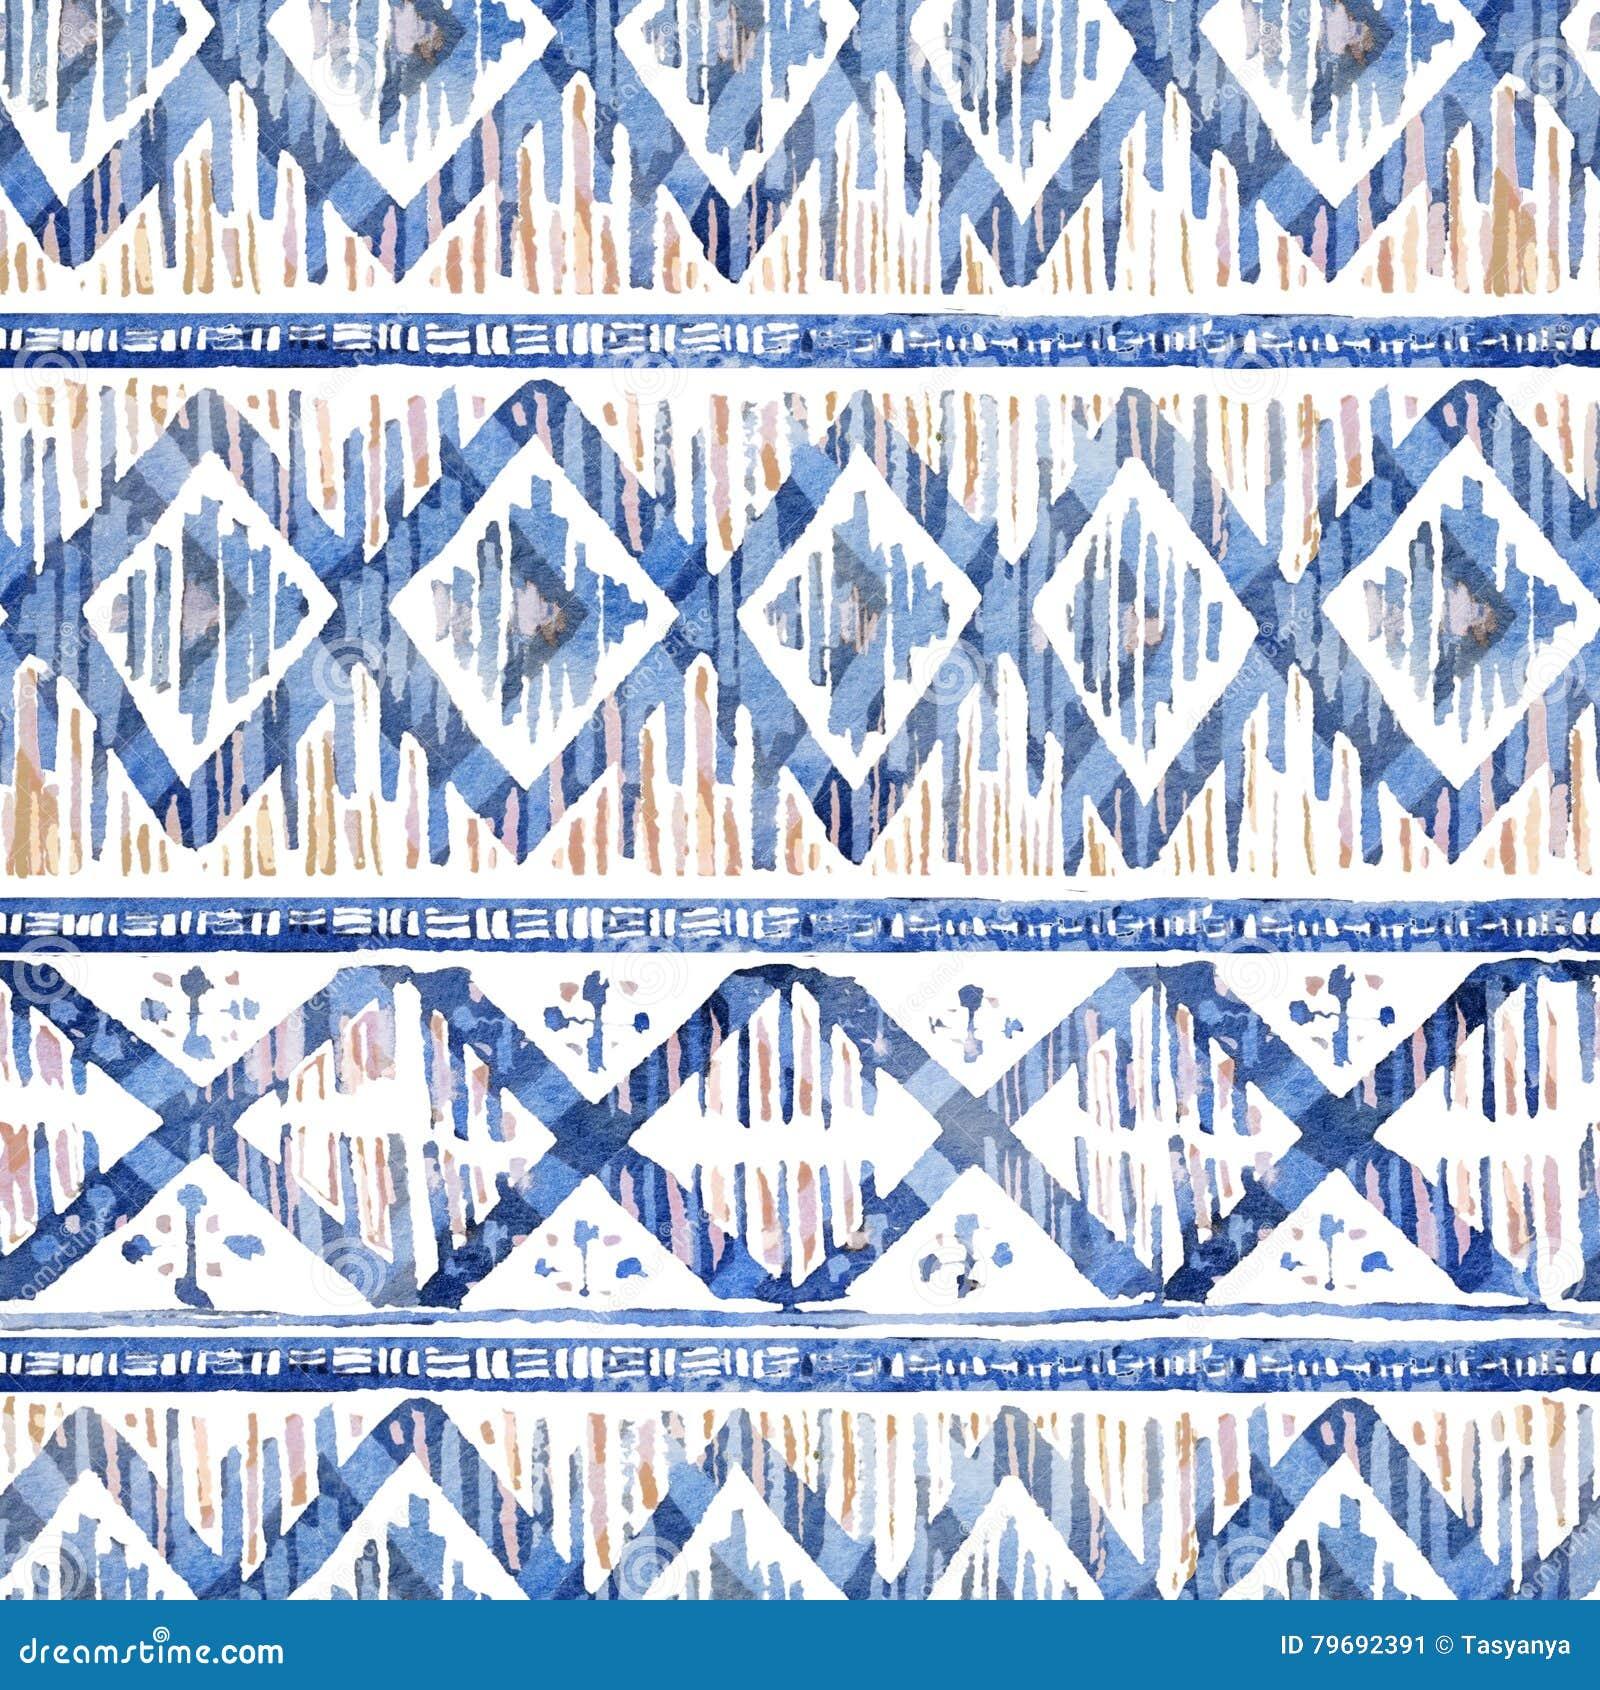 Watercolor ikat seamless pattern. Vibrant ethnic rhombus in watercolour.